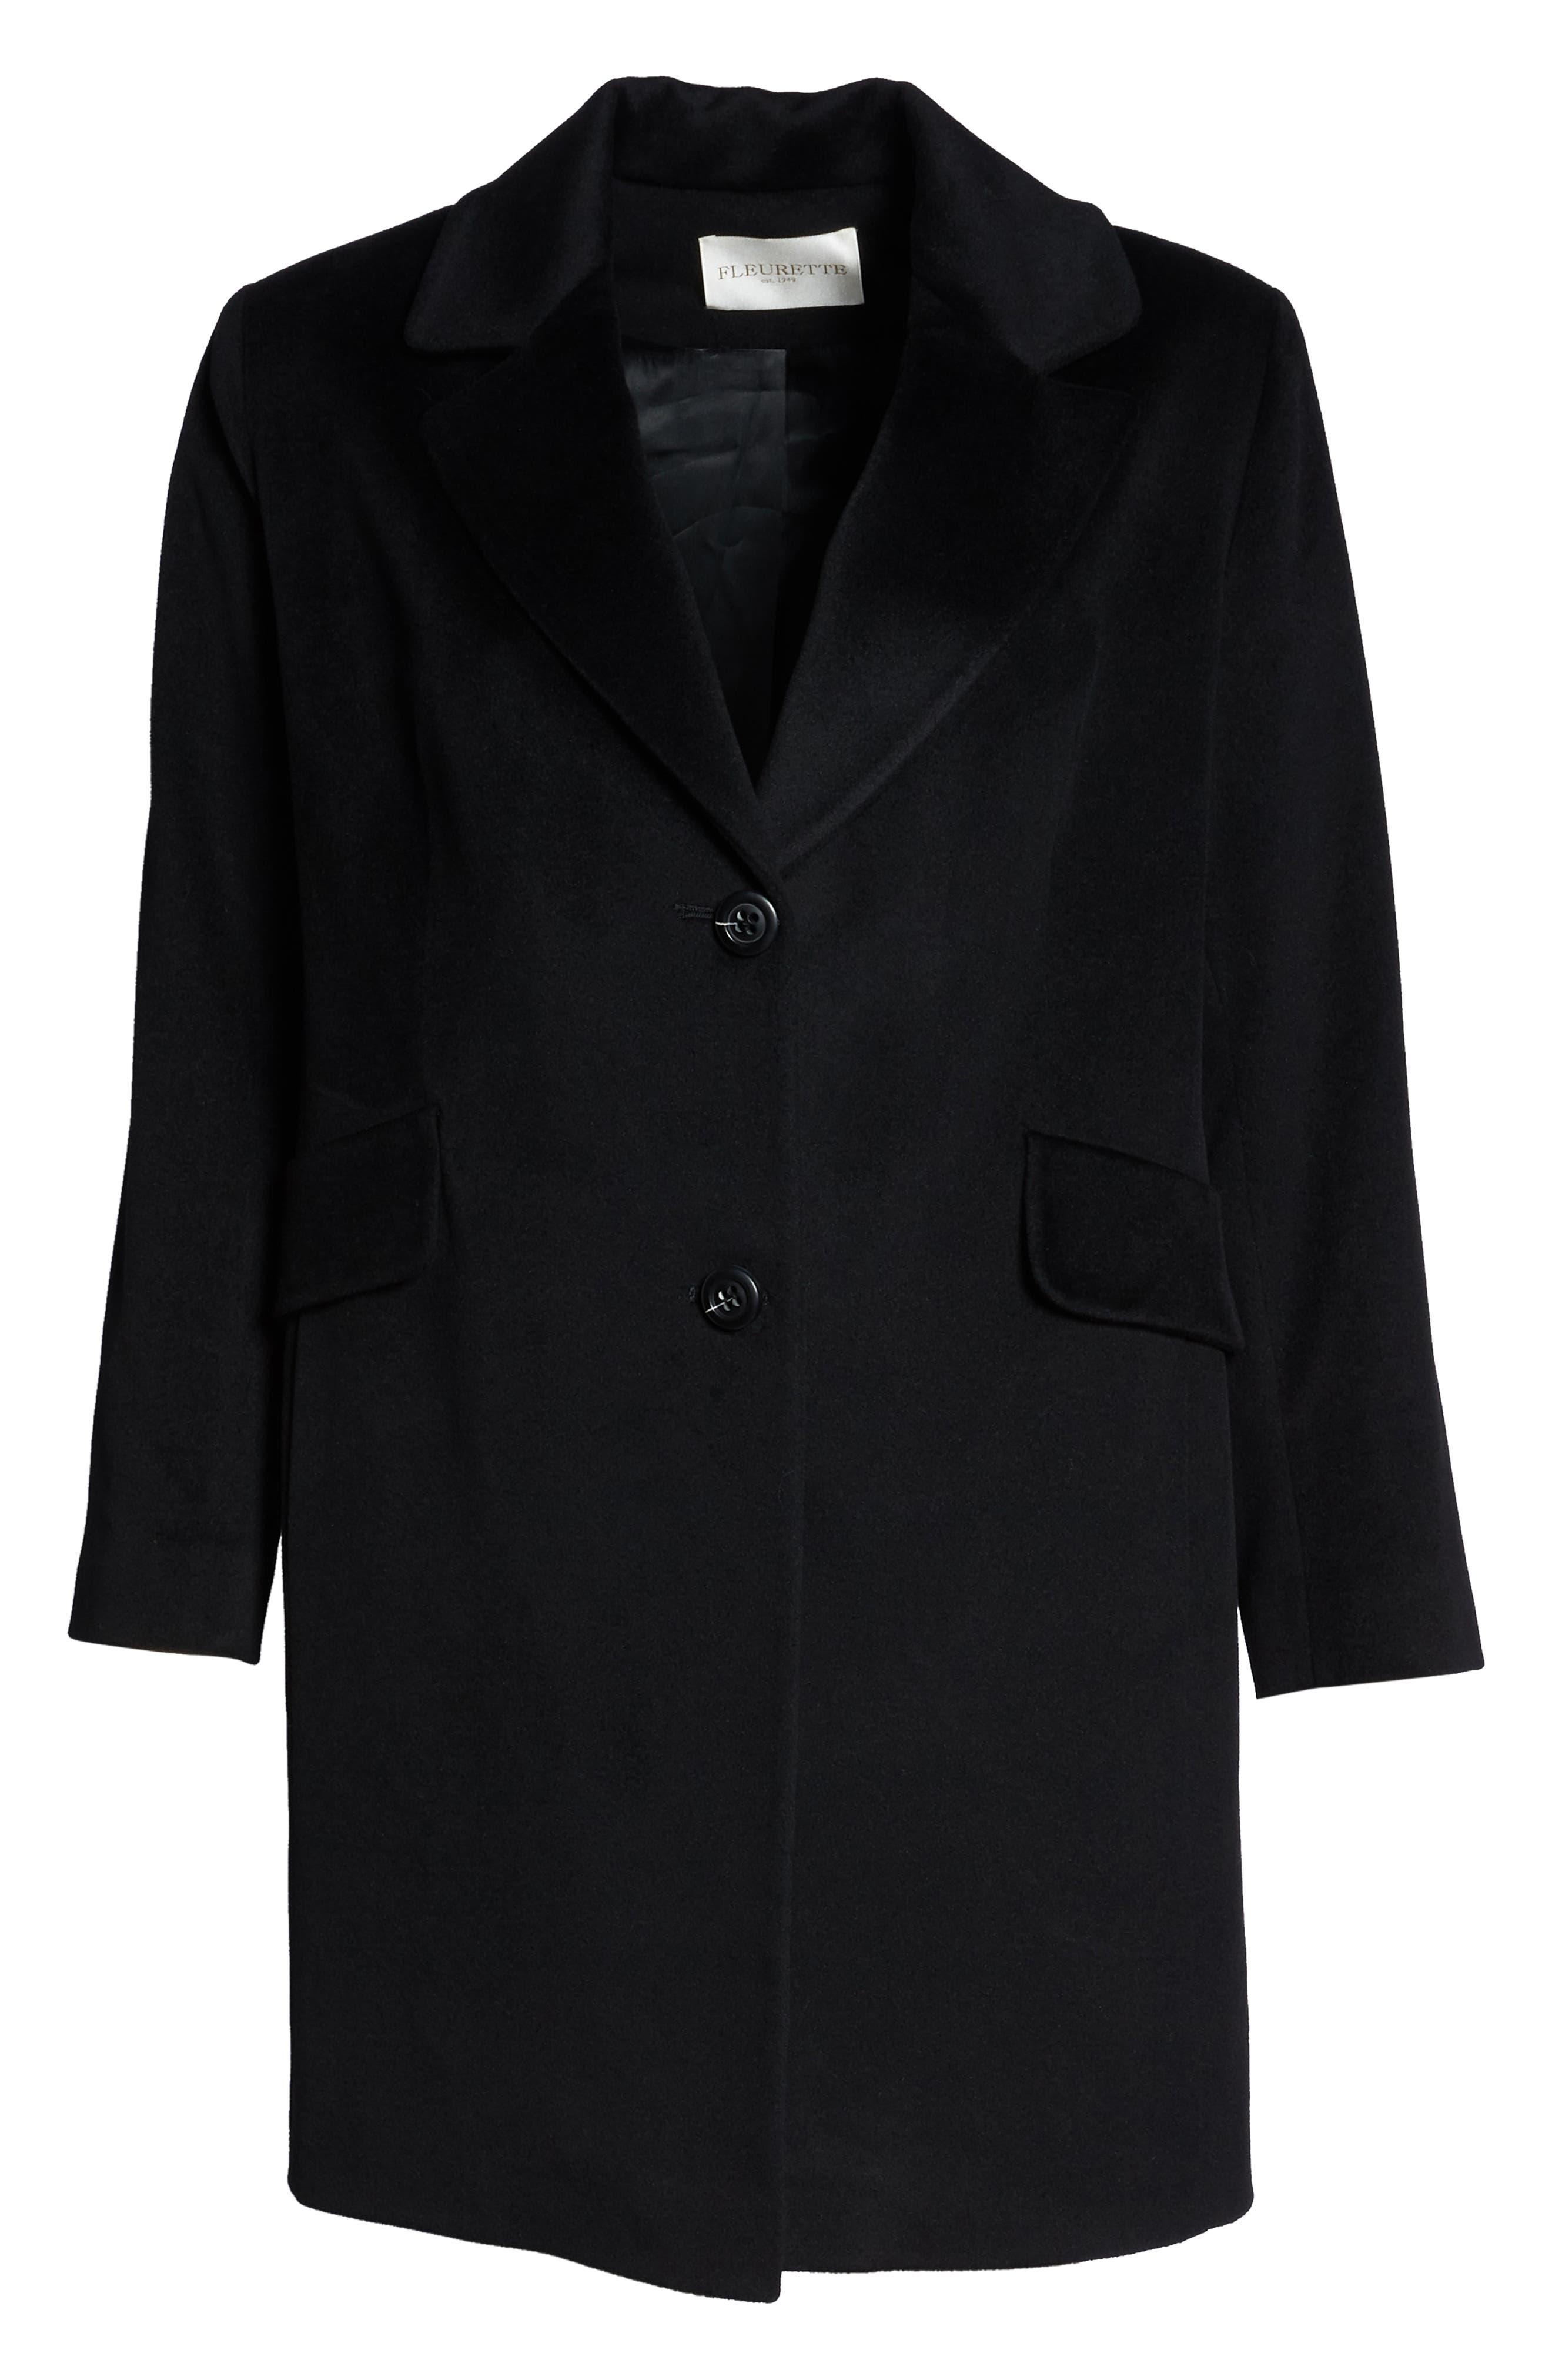 FLEURETTE,                             Notch Collar Loro Piana Wool Coat,                             Alternate thumbnail 6, color,                             BLACK